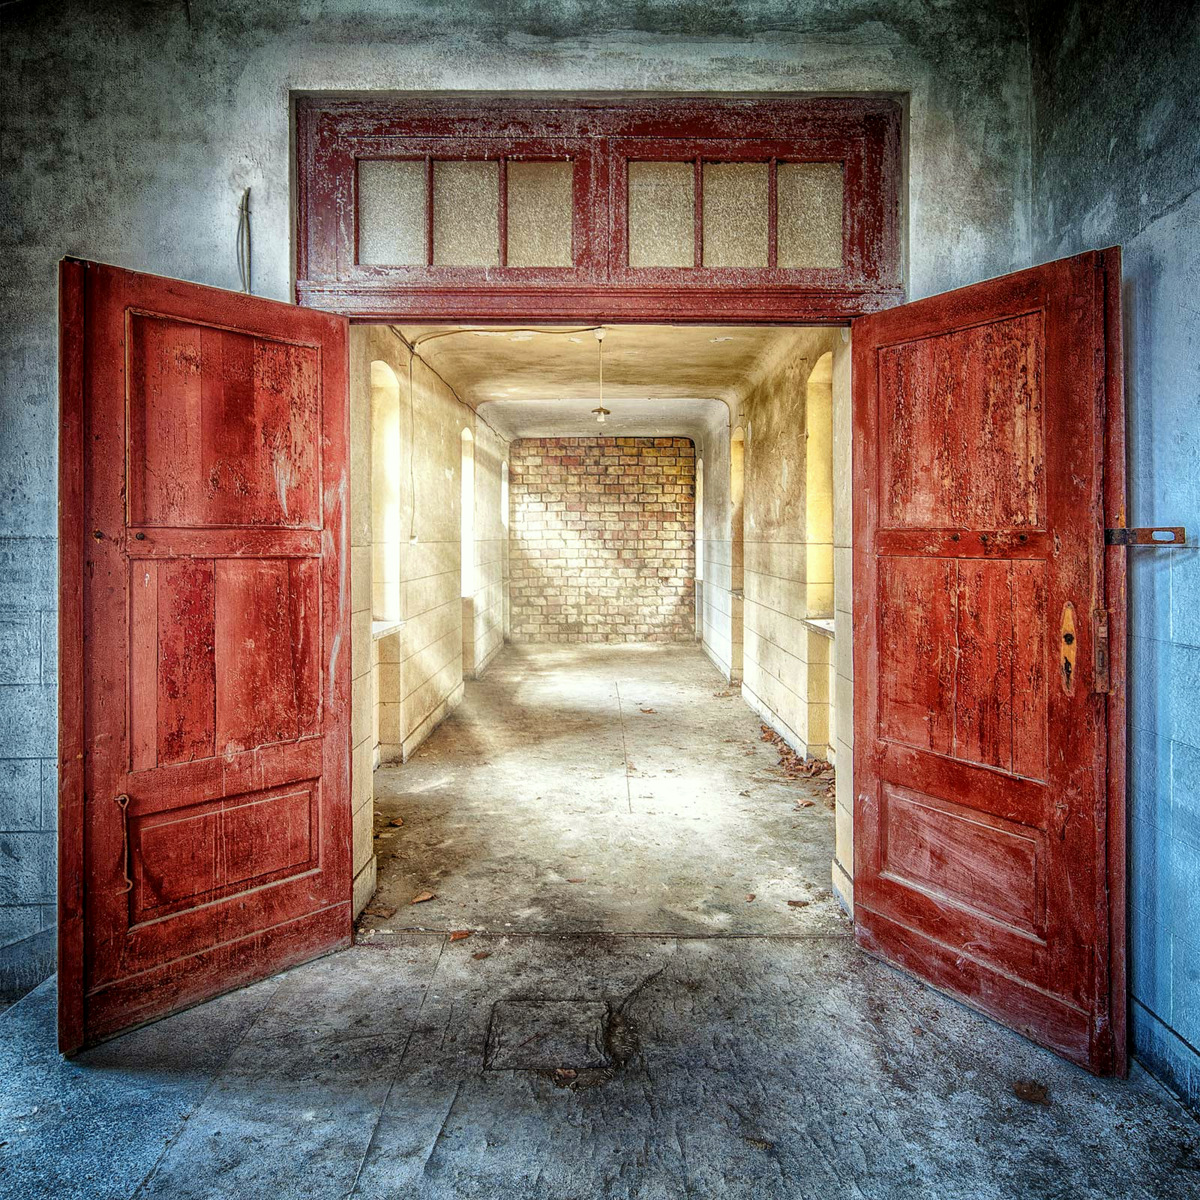 Day of open doors V by Markus Studtmann